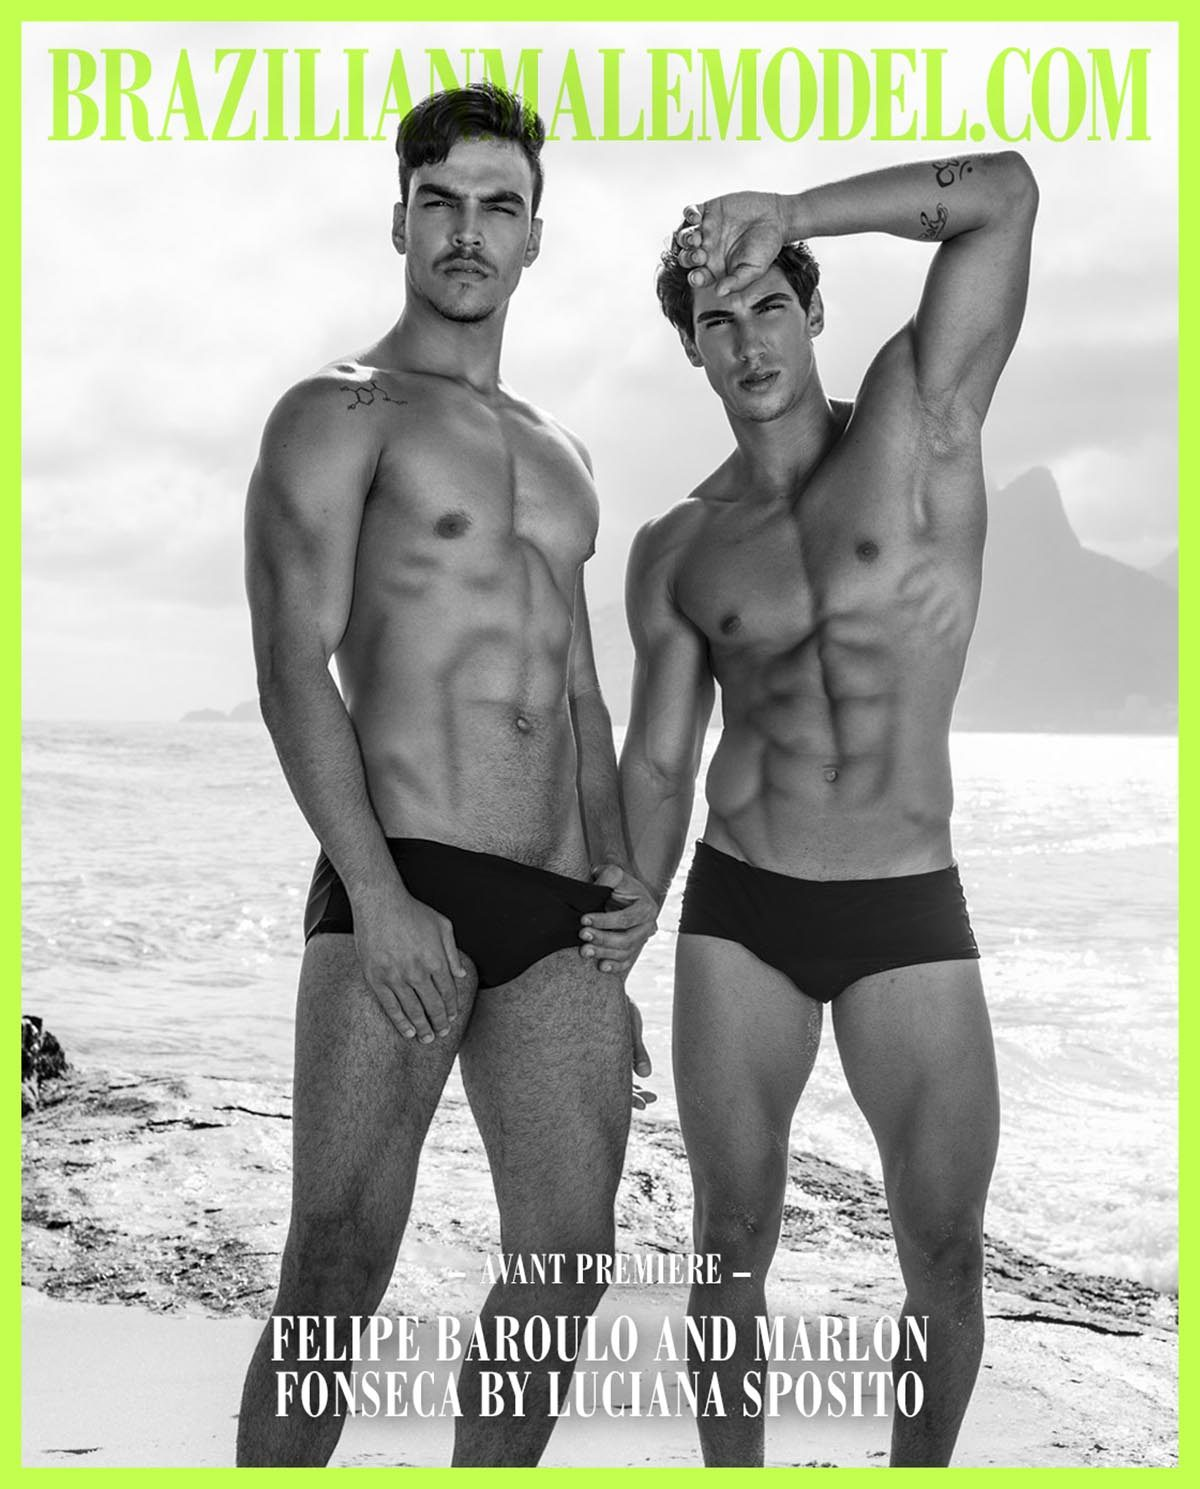 Felipe Baroulo and Marlon Fonseca by Luciana Sposito